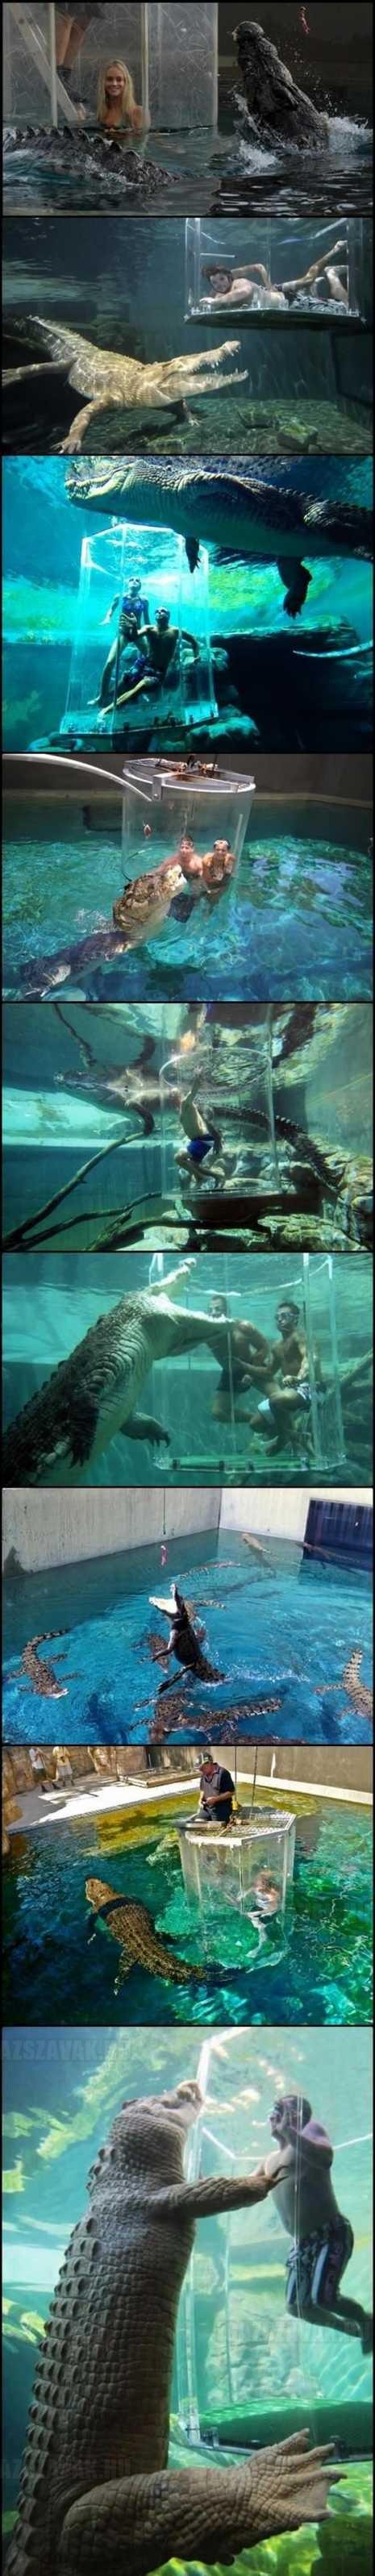 Krokodil park